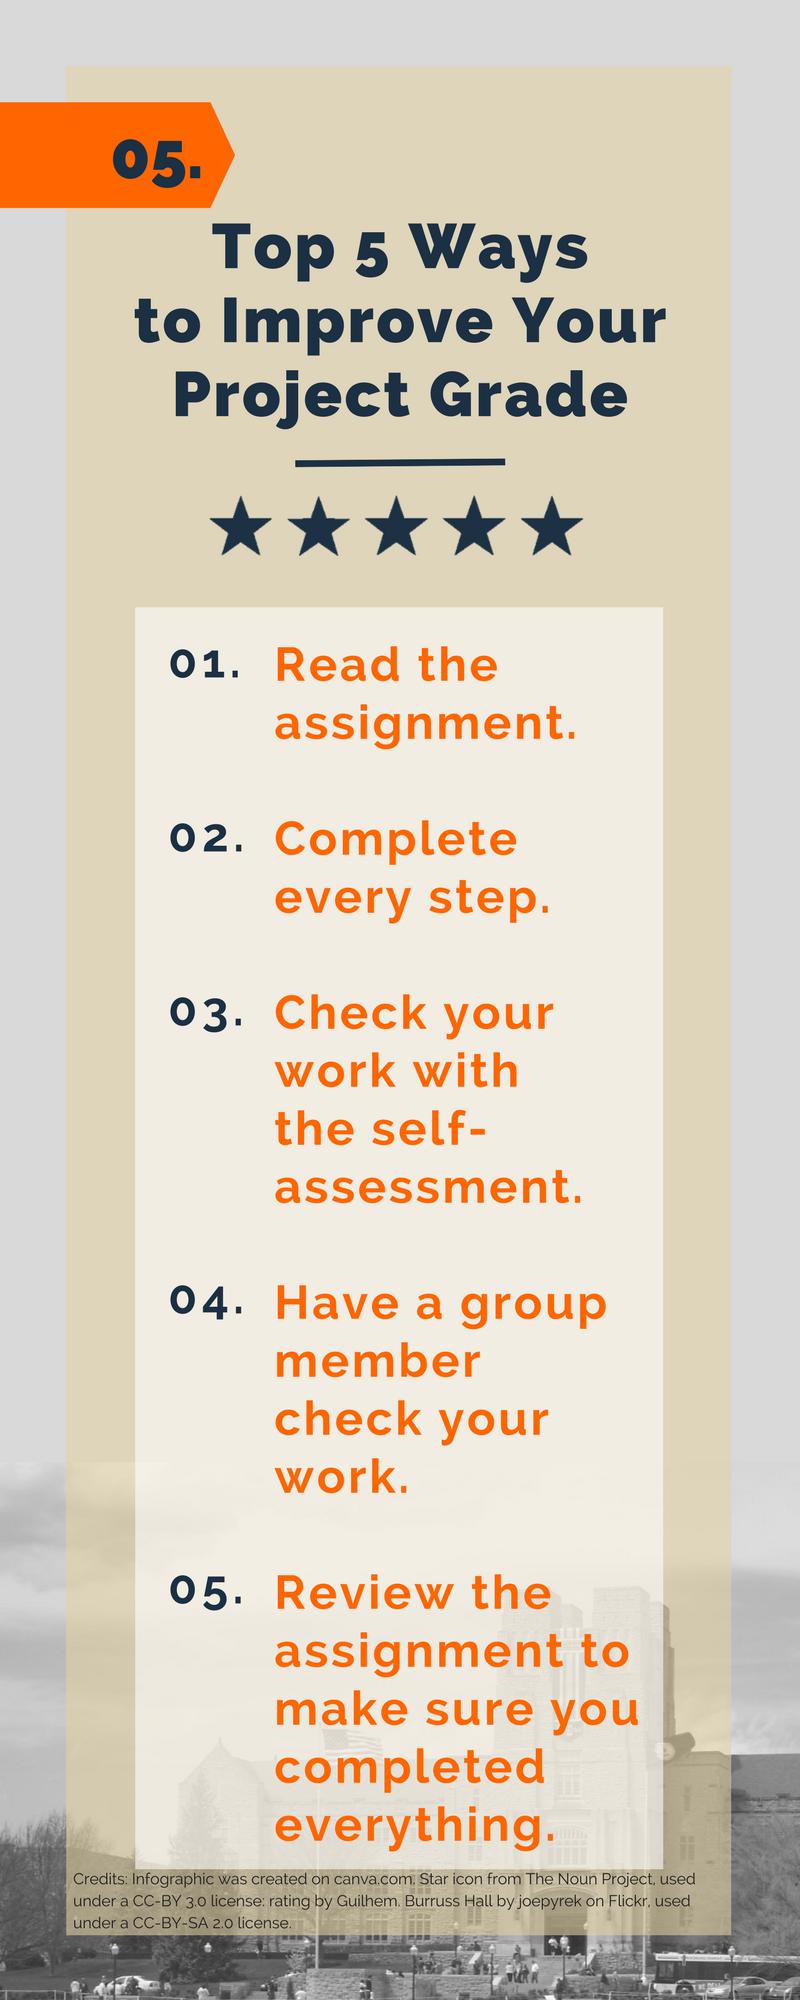 Top 5 Ways to Improve Your Grade